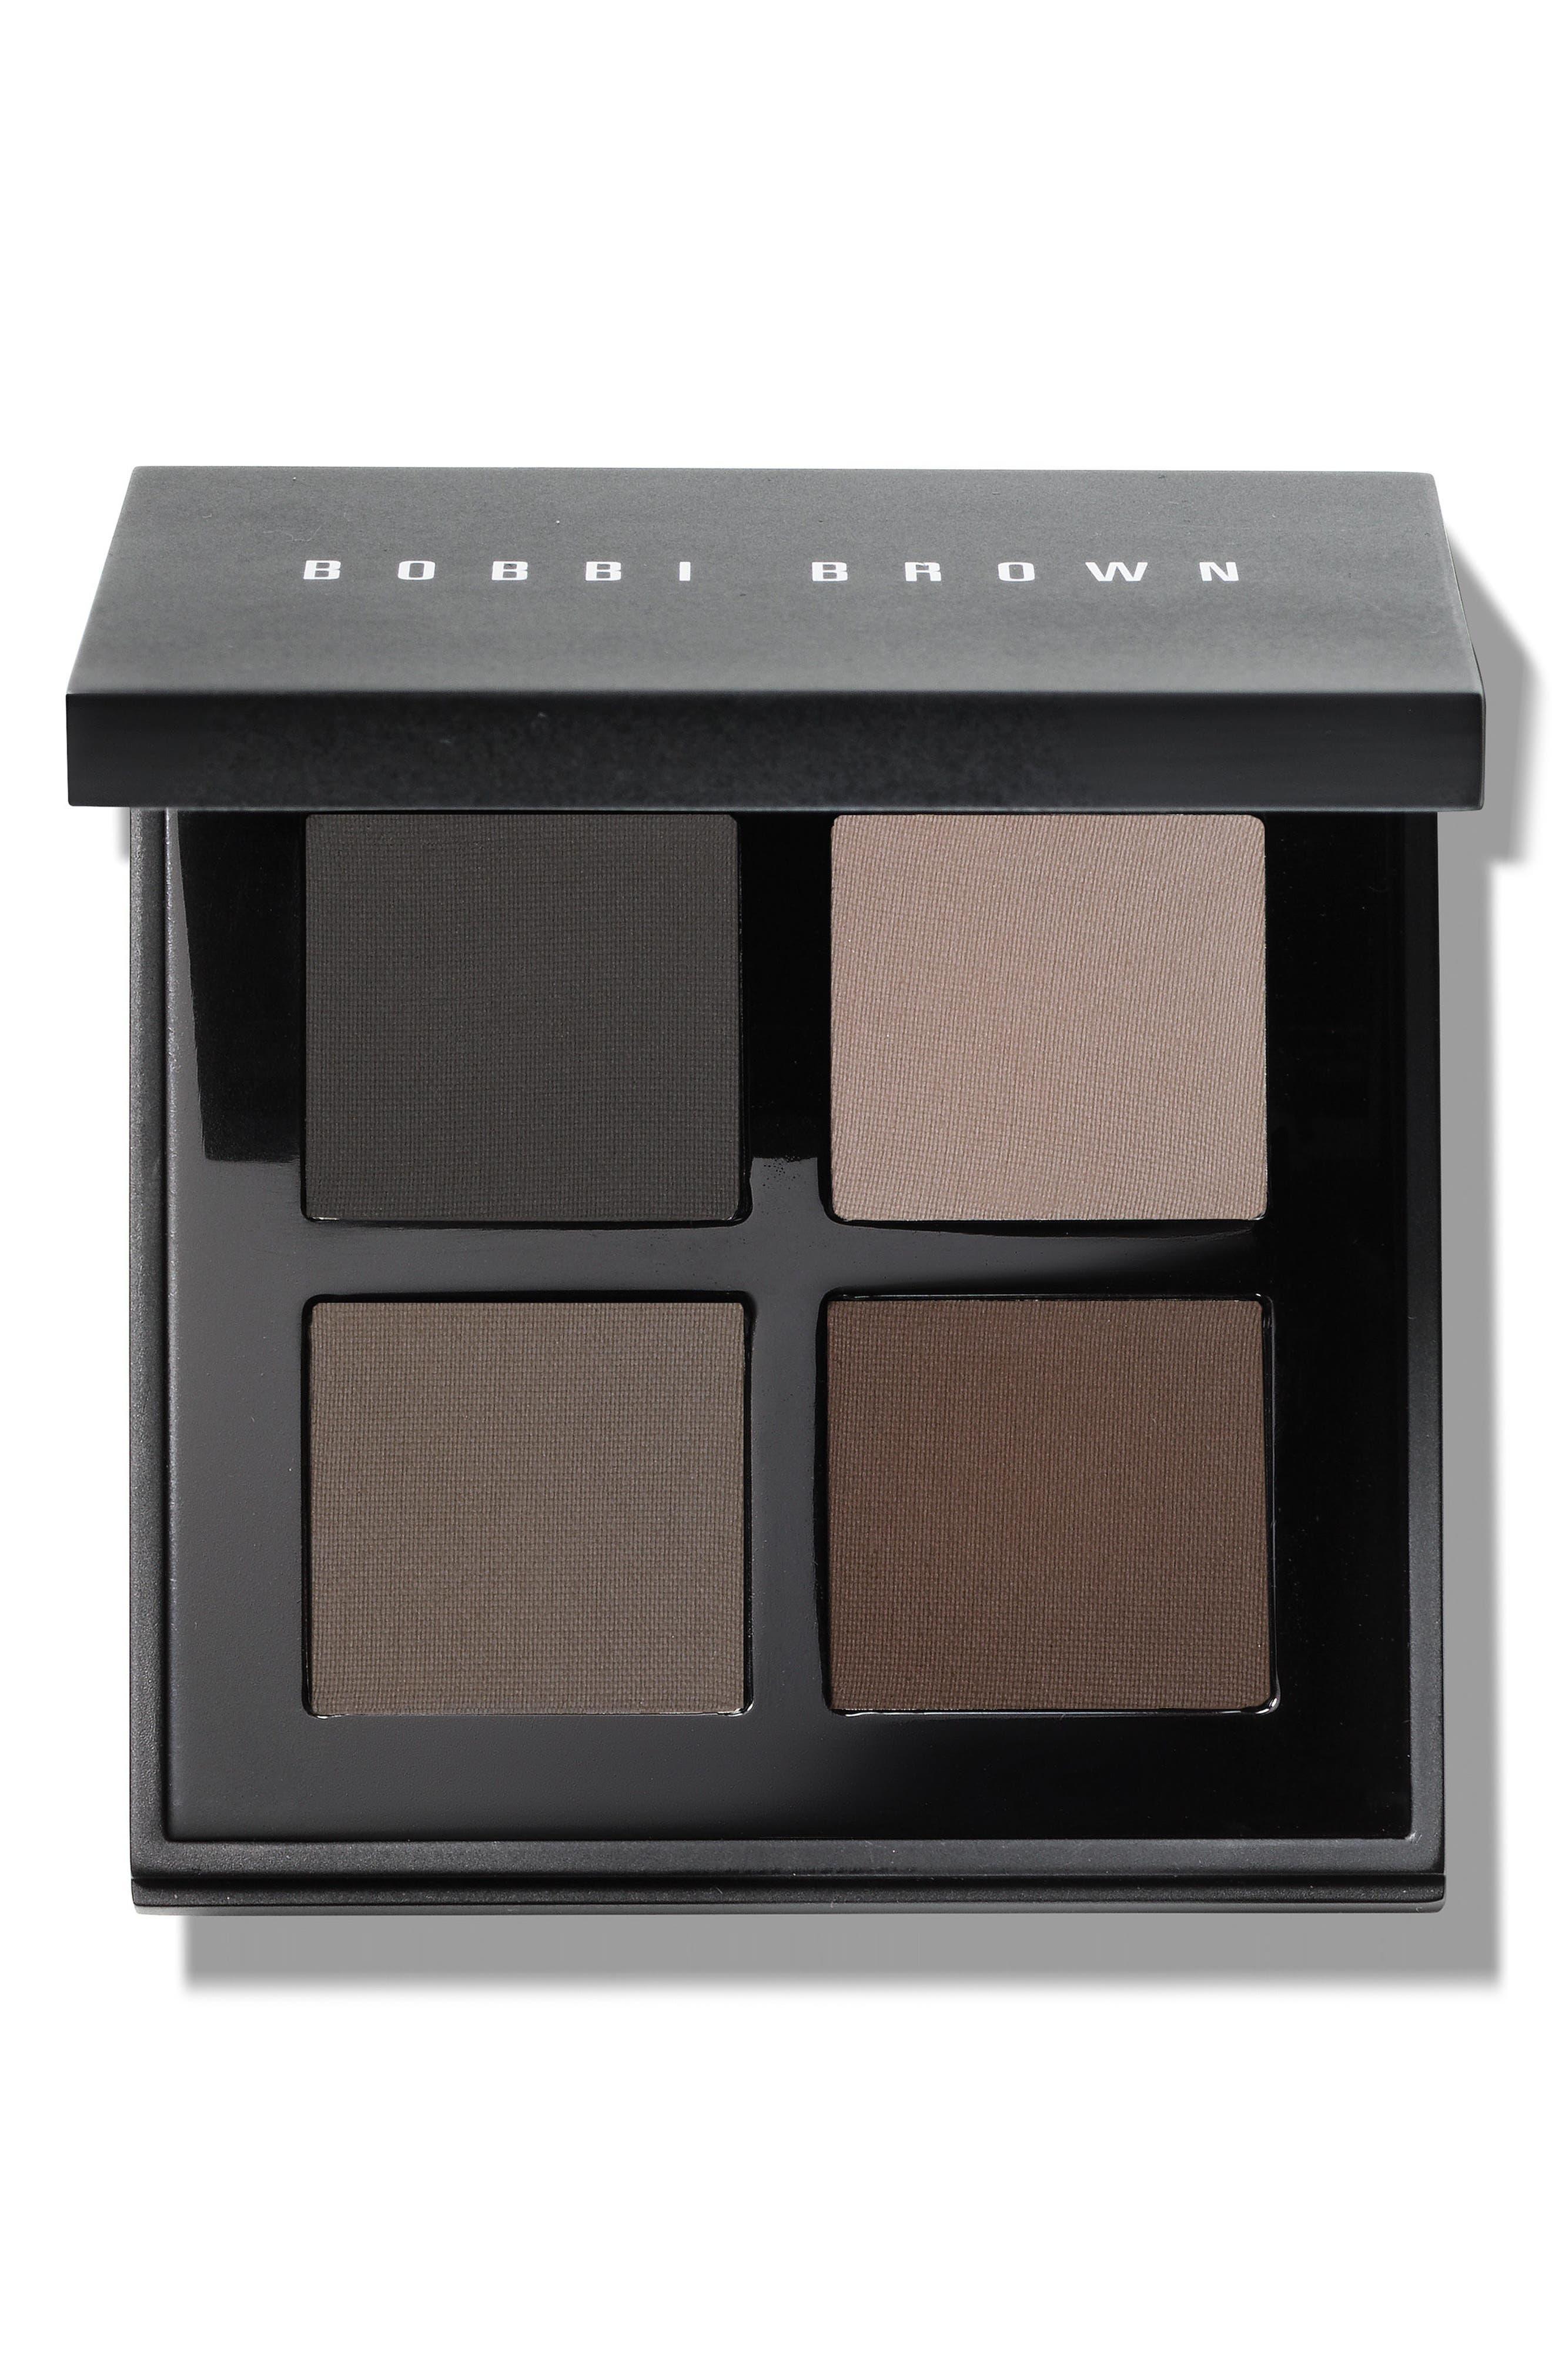 Alternate Image 1 Selected - Bobbi Brown Downtown Cool Eyeshadow Palette